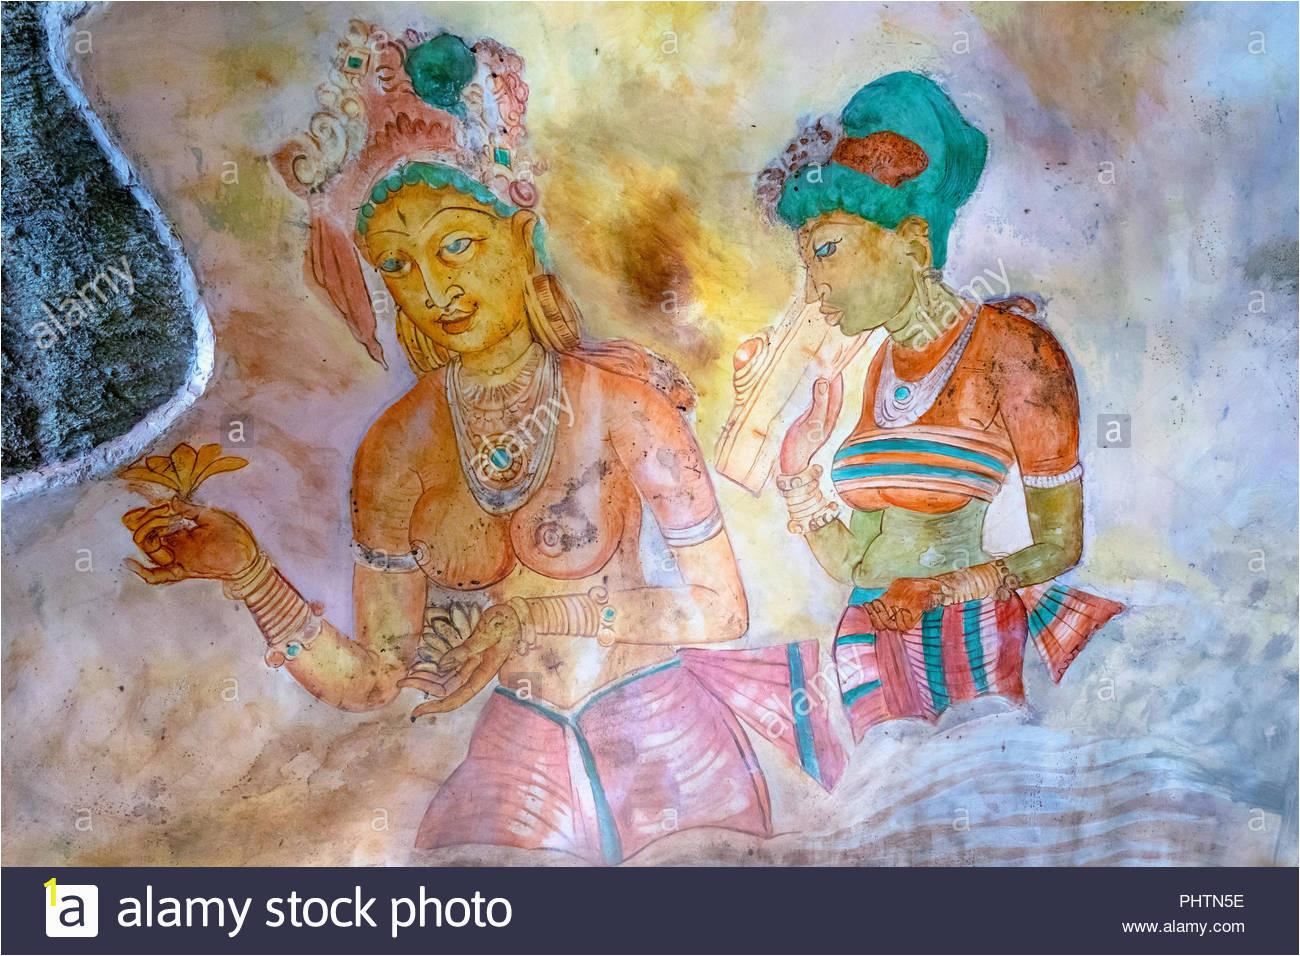 replica of the famous wall paintings at sigiriya sigiriya museum sigiriya sri lanka PHTN5E